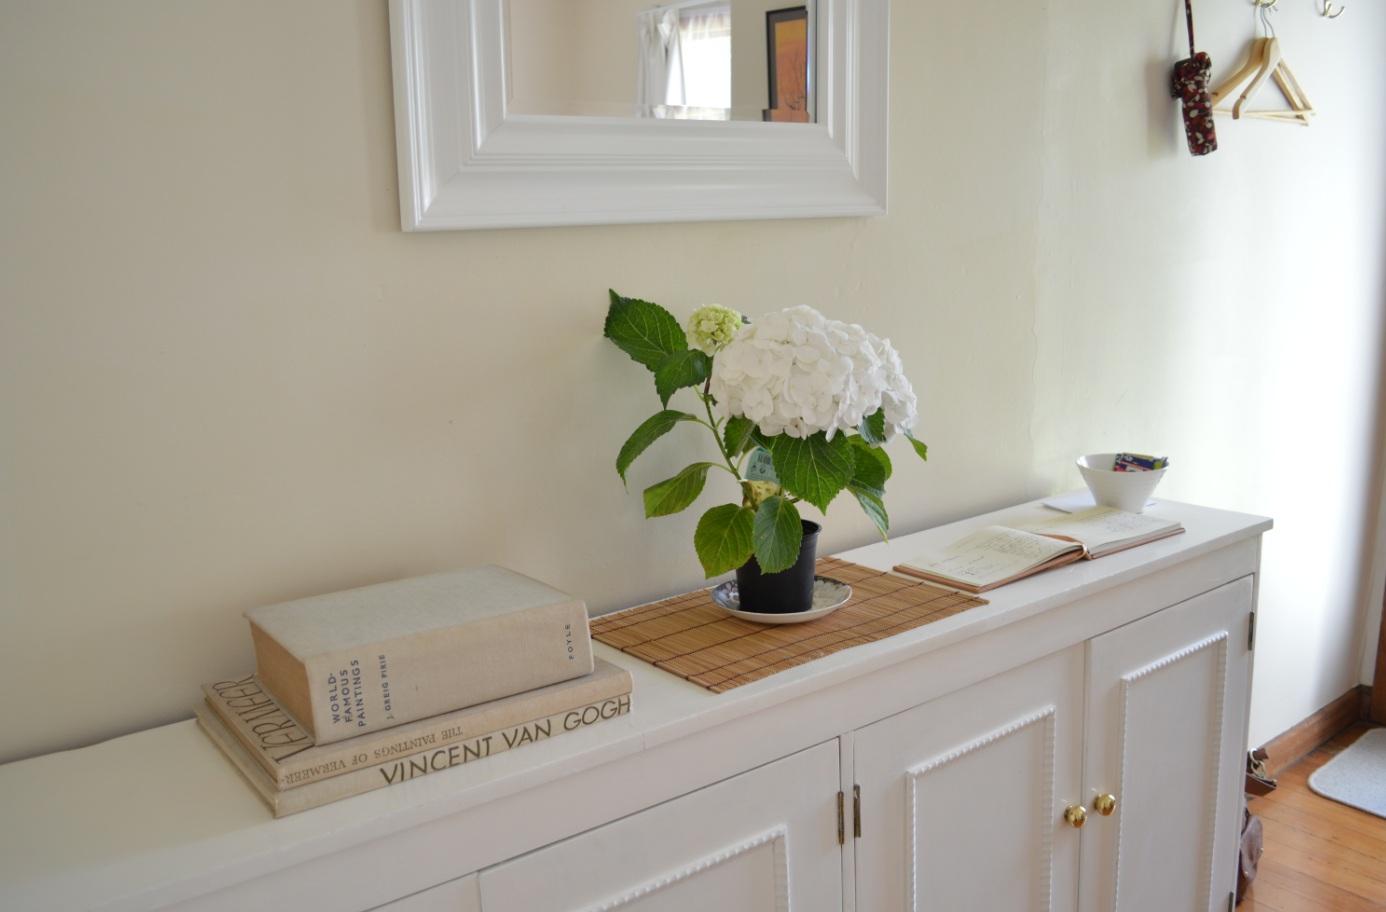 http://2.bp.blogspot.com/-THHVEuXEuyI/UIIURziZeNI/AAAAAAAAFgY/2BsgBKVb_UM/s1600/Living+room+buffet+change5.jpg